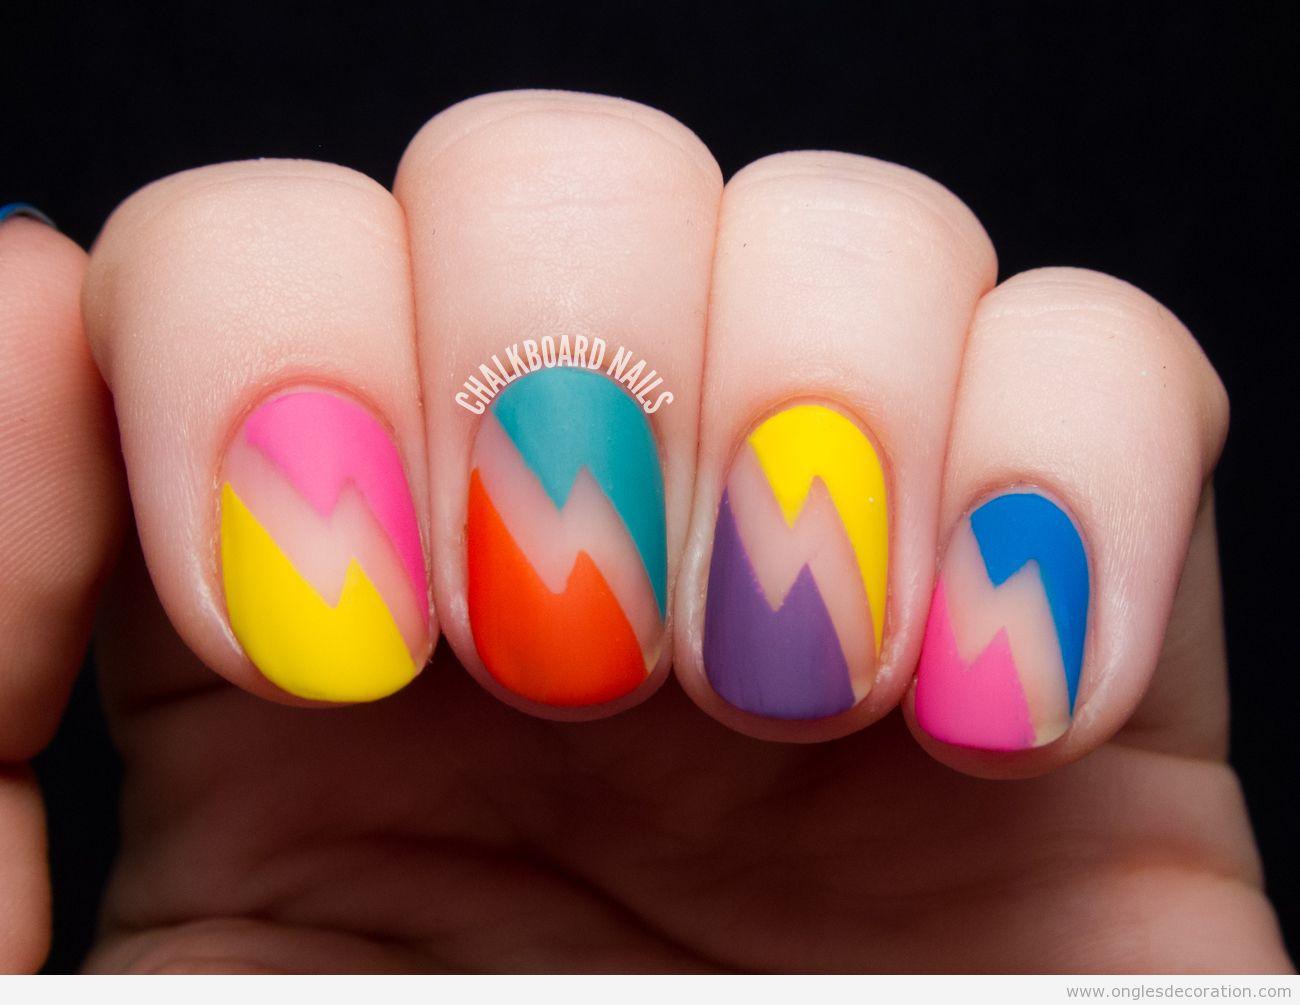 Motif Deco Ongle Beautiful Nail Art En Dcoration Complte